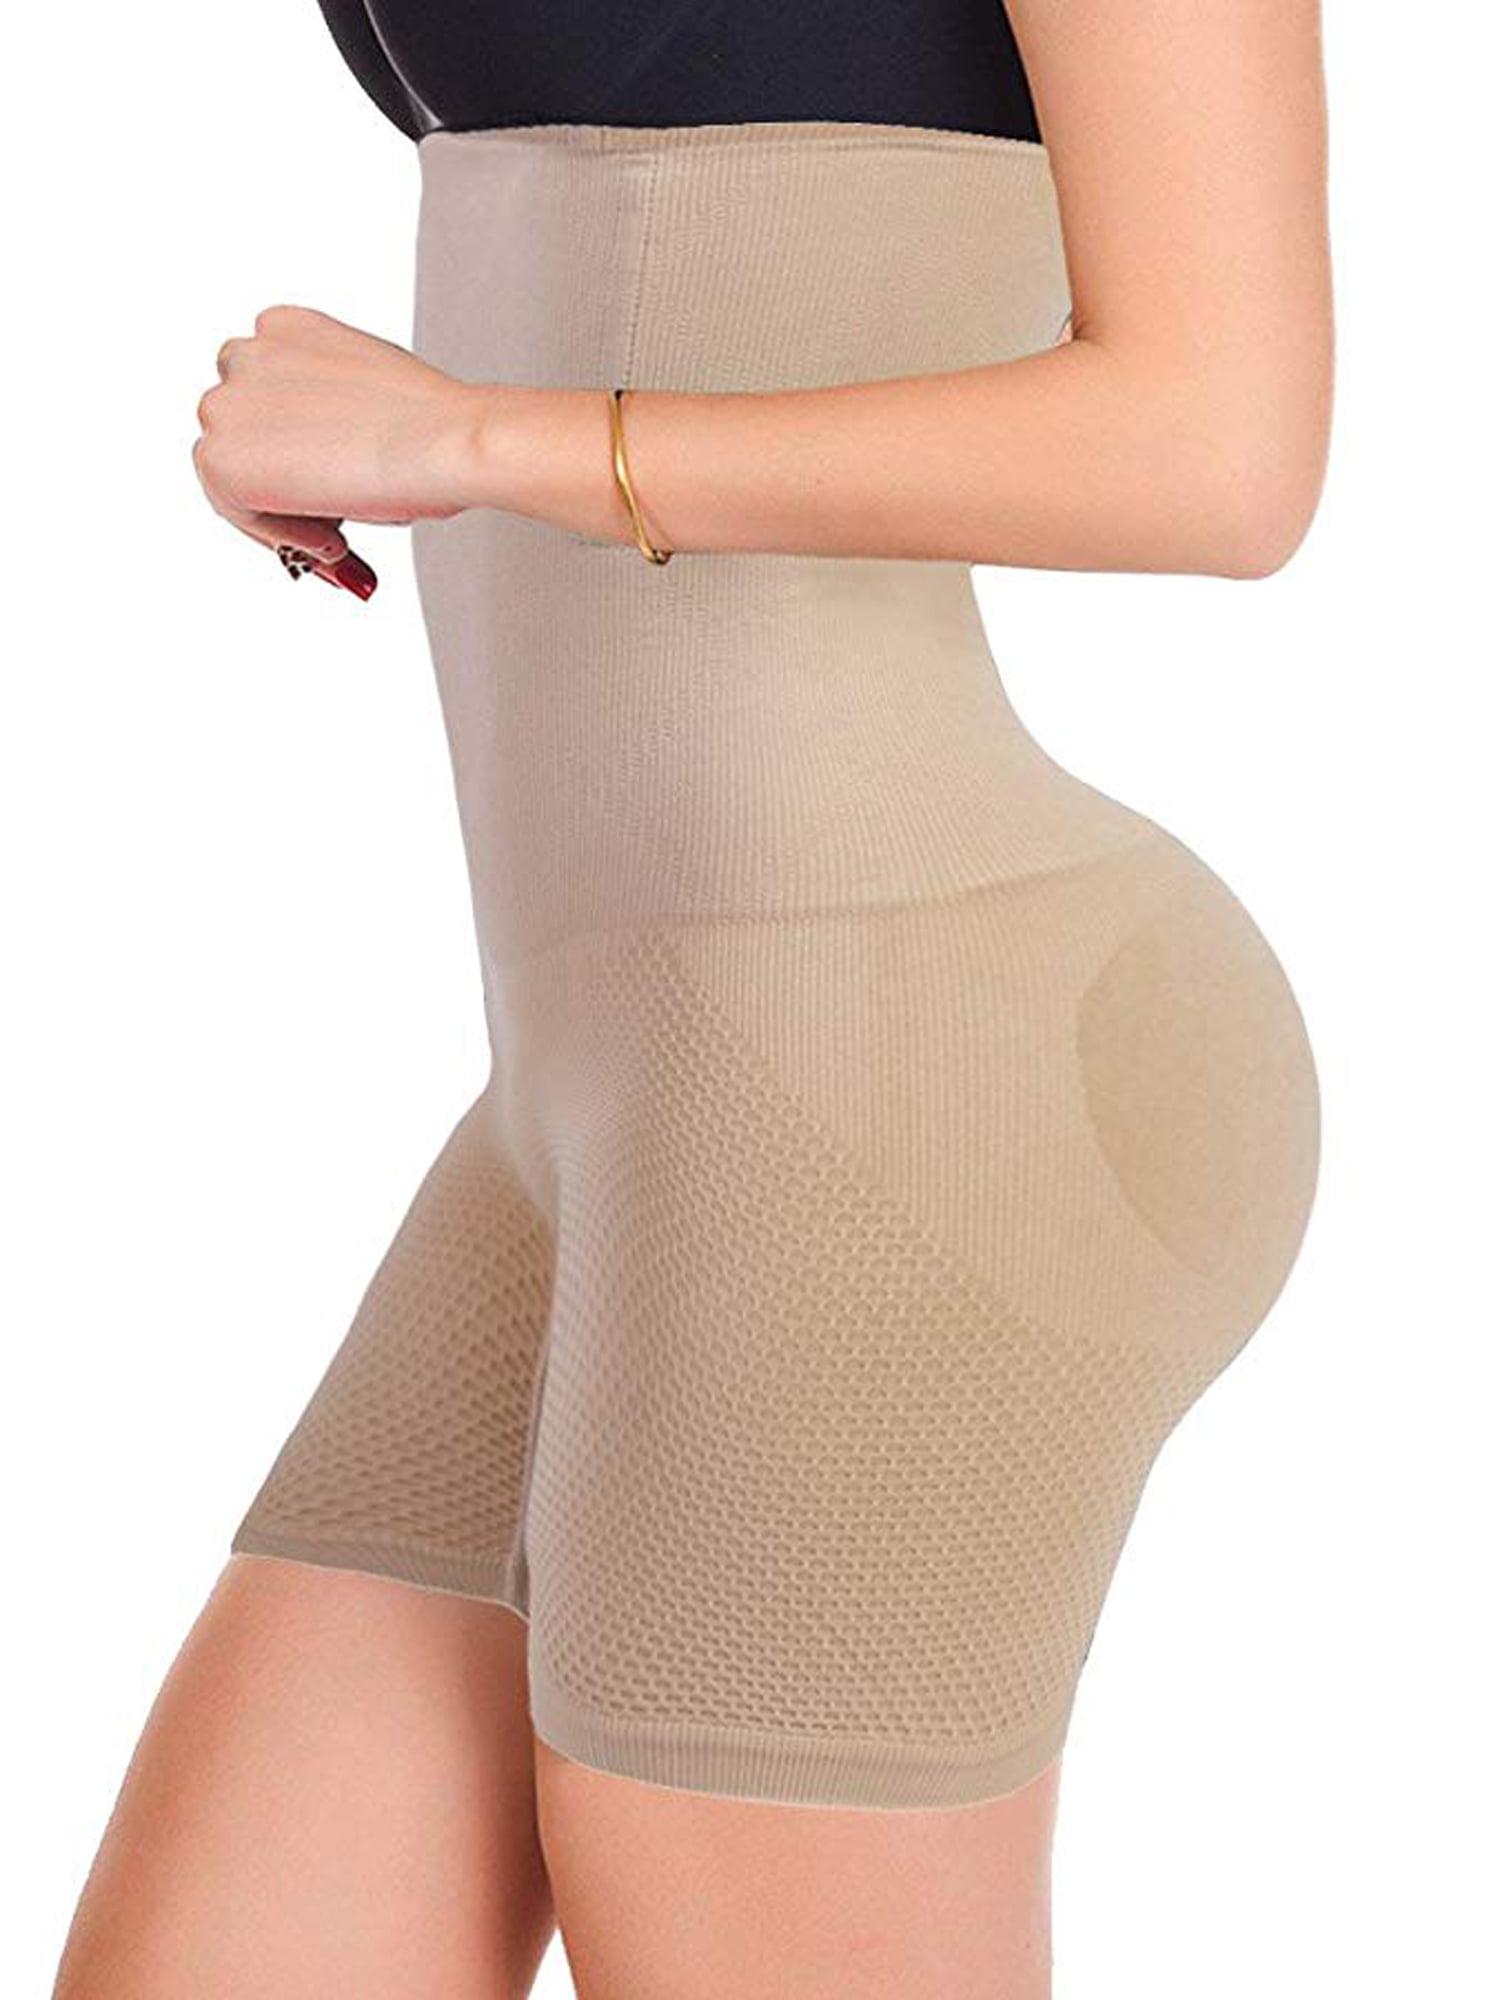 Womens Shapewear Panties Body Shaper High Waist Tummy Control Seamless Shorts Women's Clothing